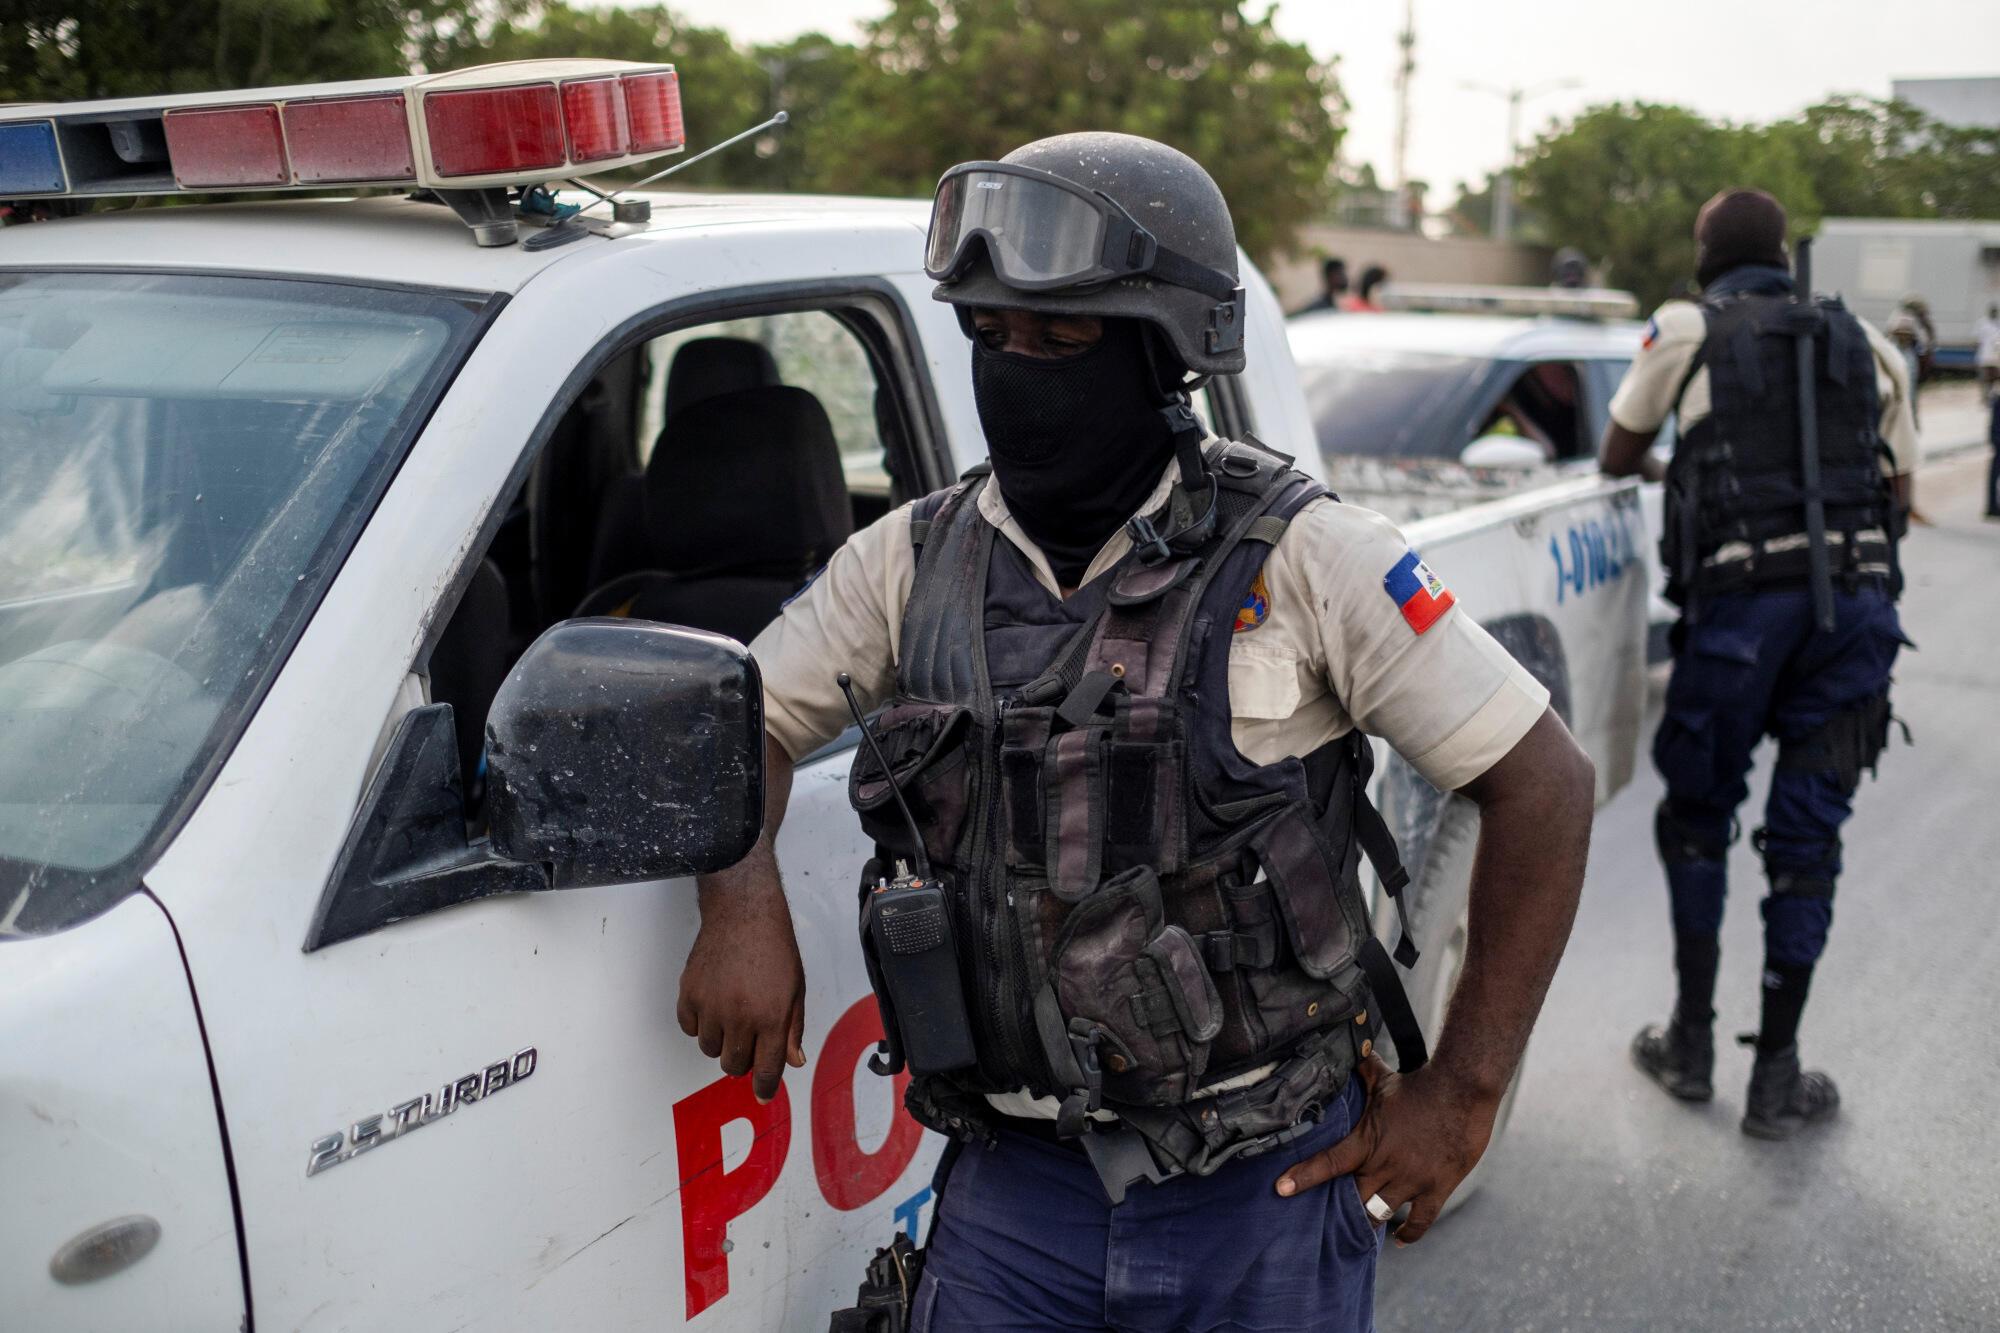 Haiti - policiers - police - US embassy - ambassade américaine